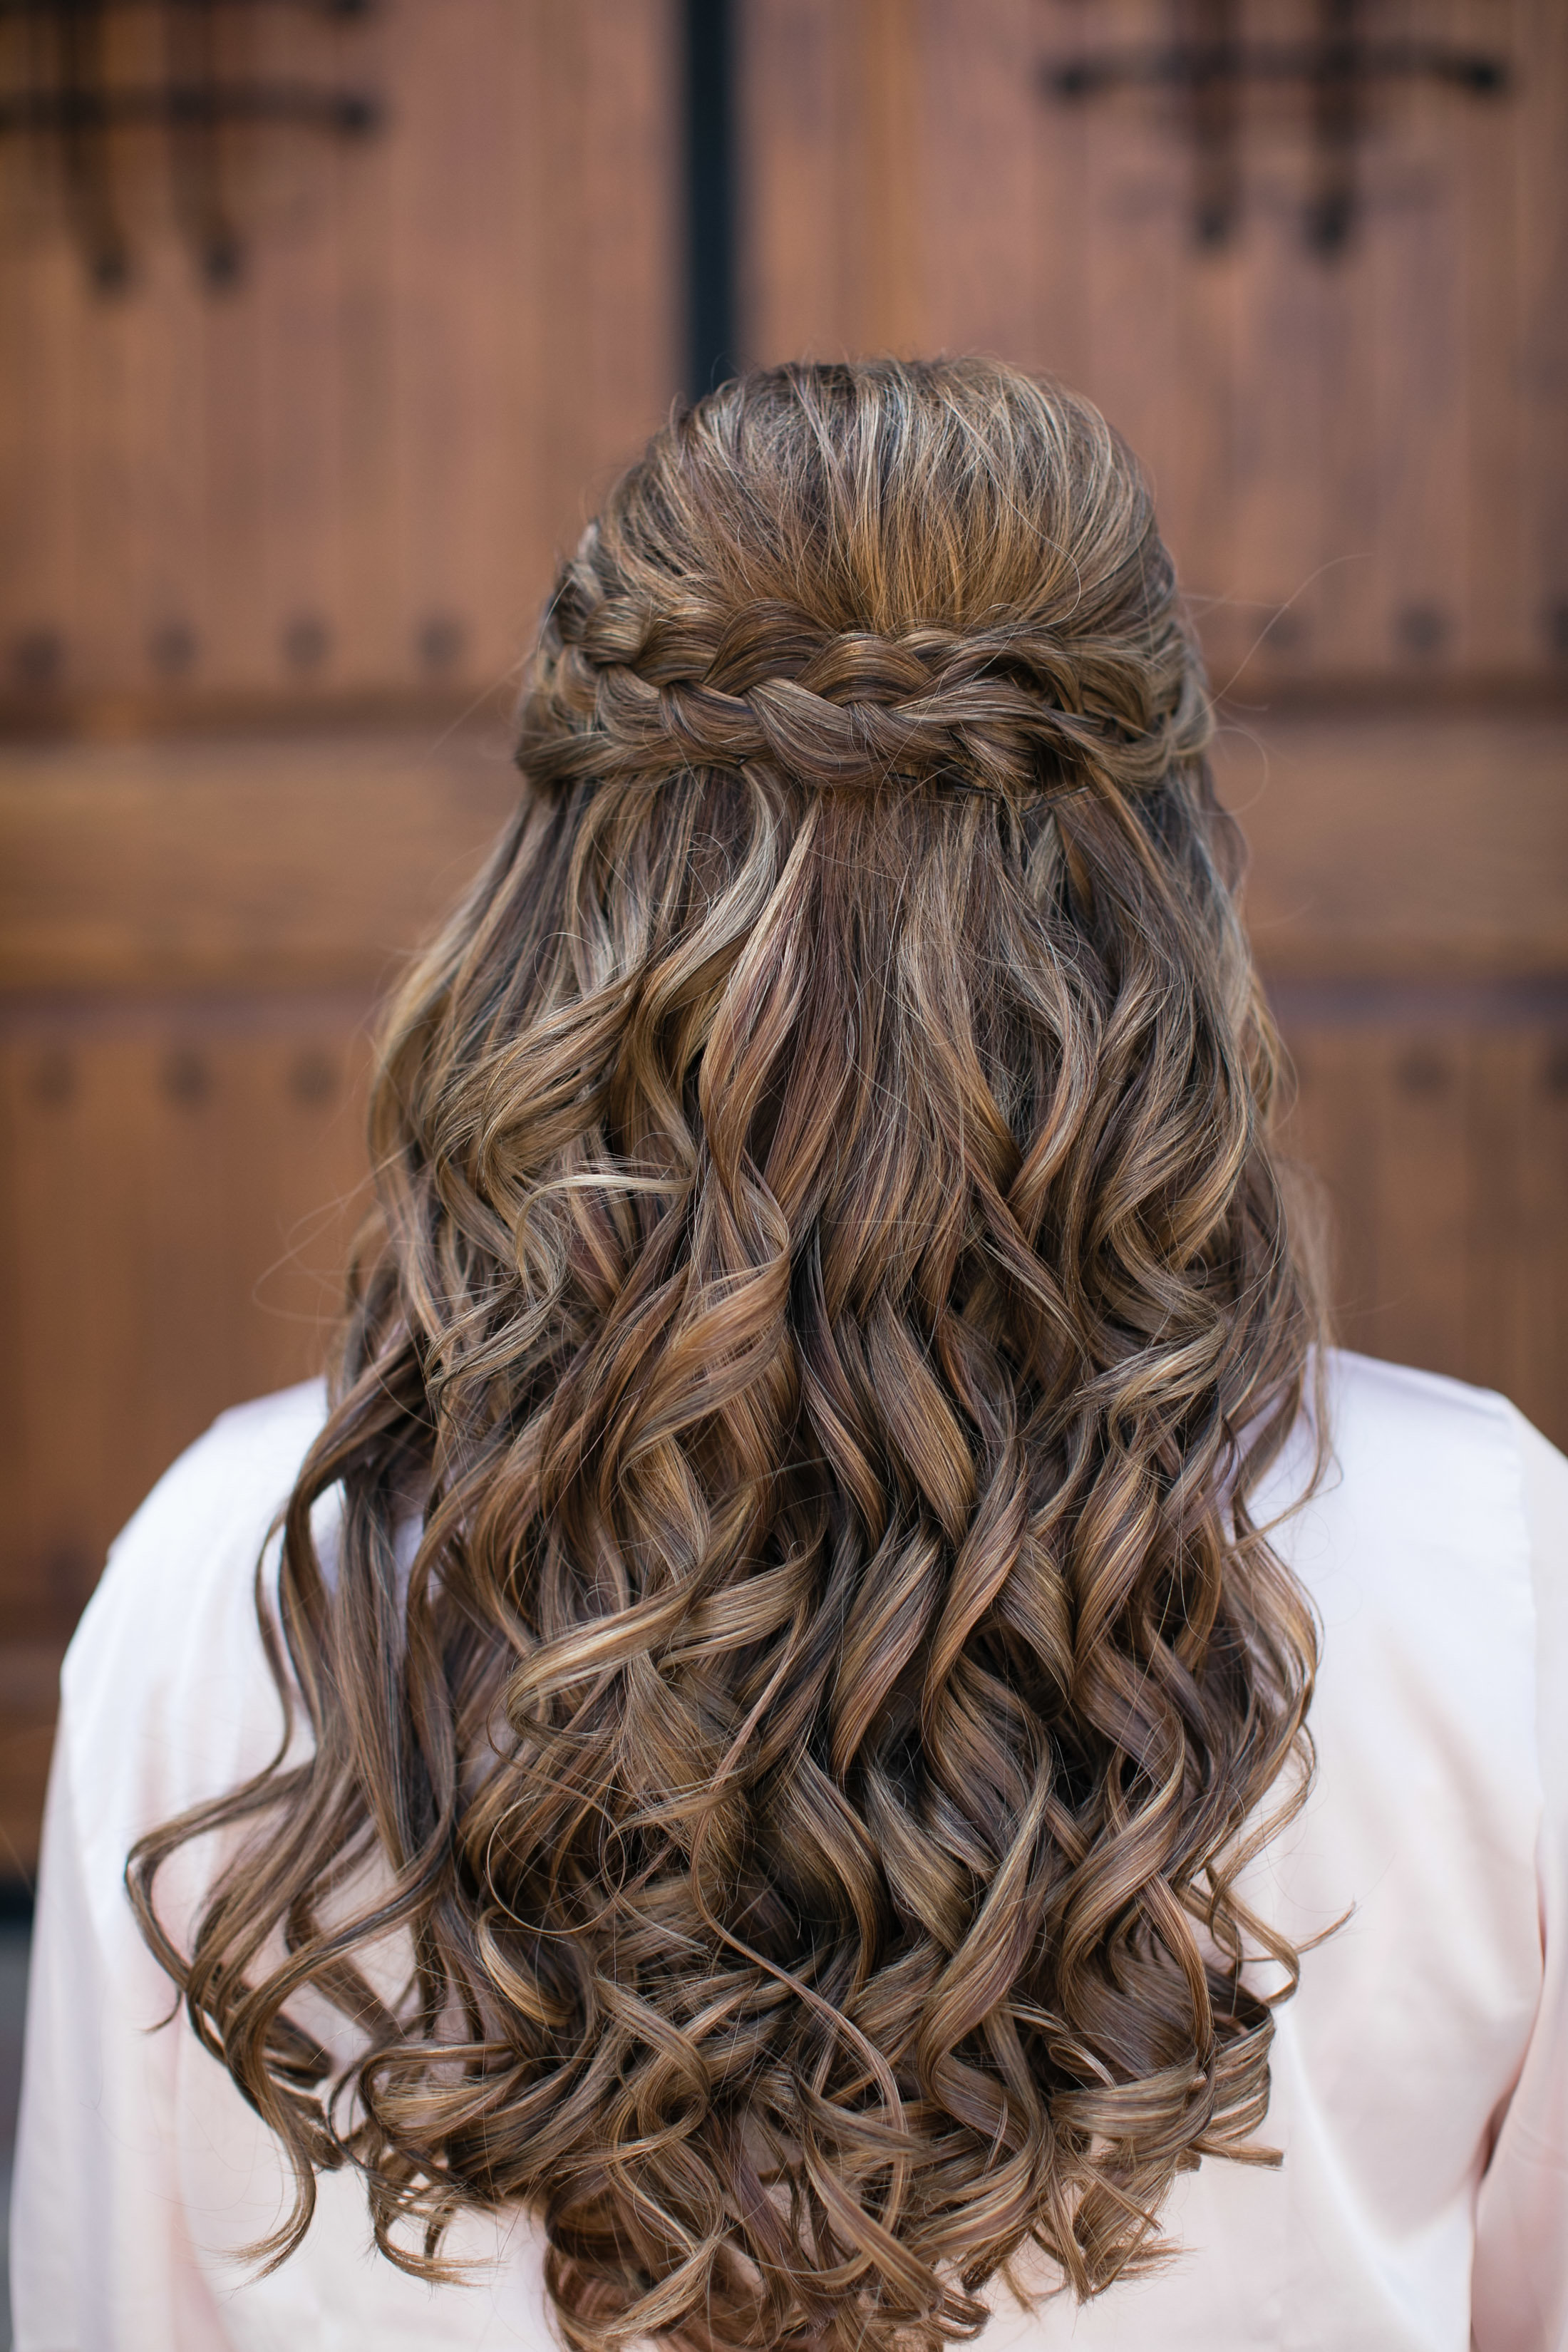 Denver-wedding-makeup-and-hair